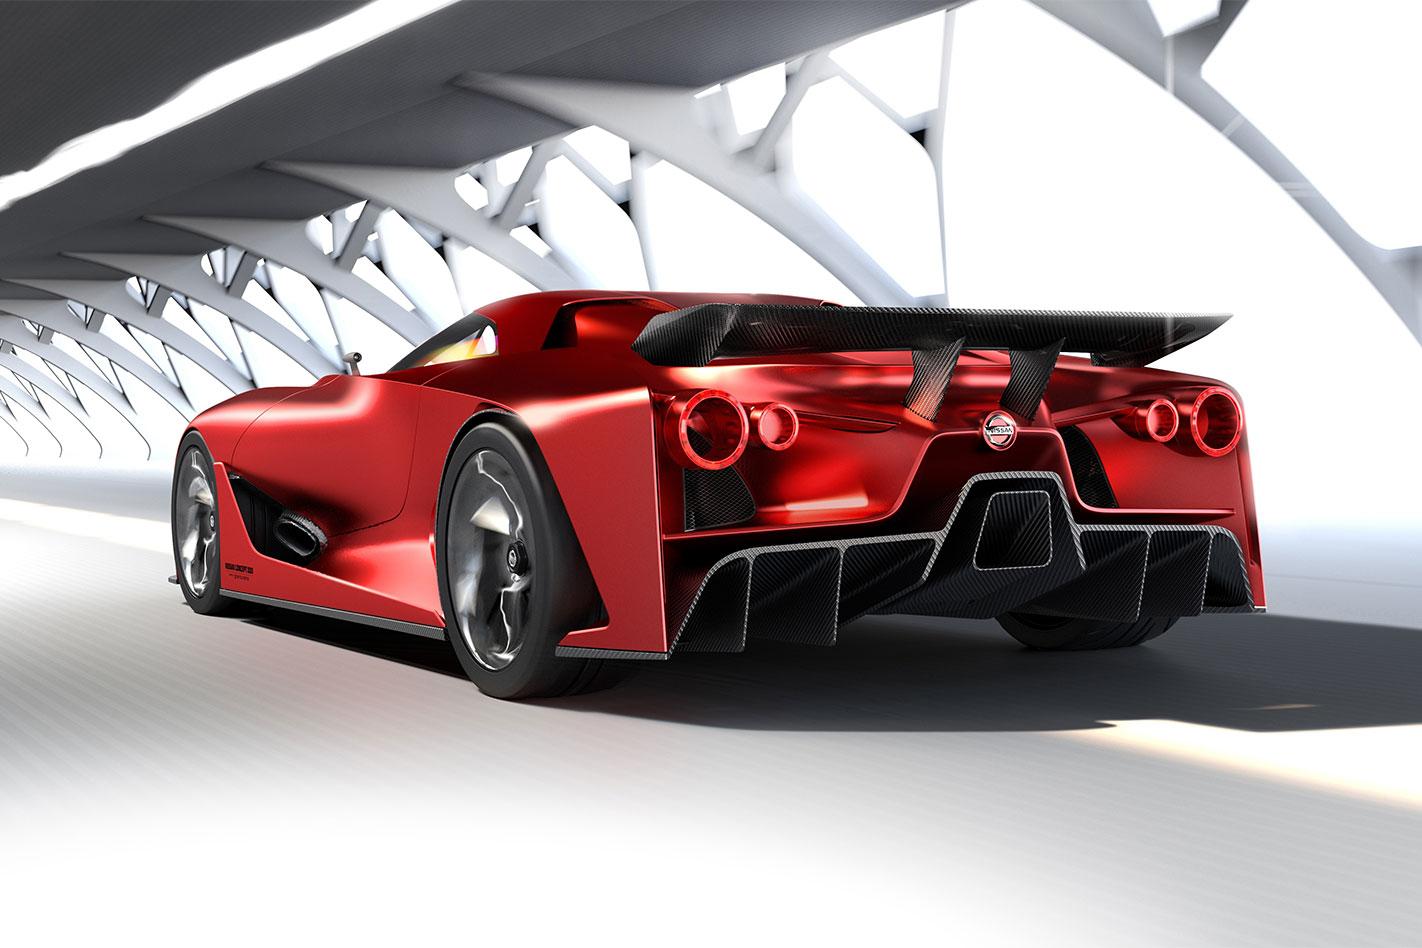 Nissan -Vision -Gran -Turismo -rear